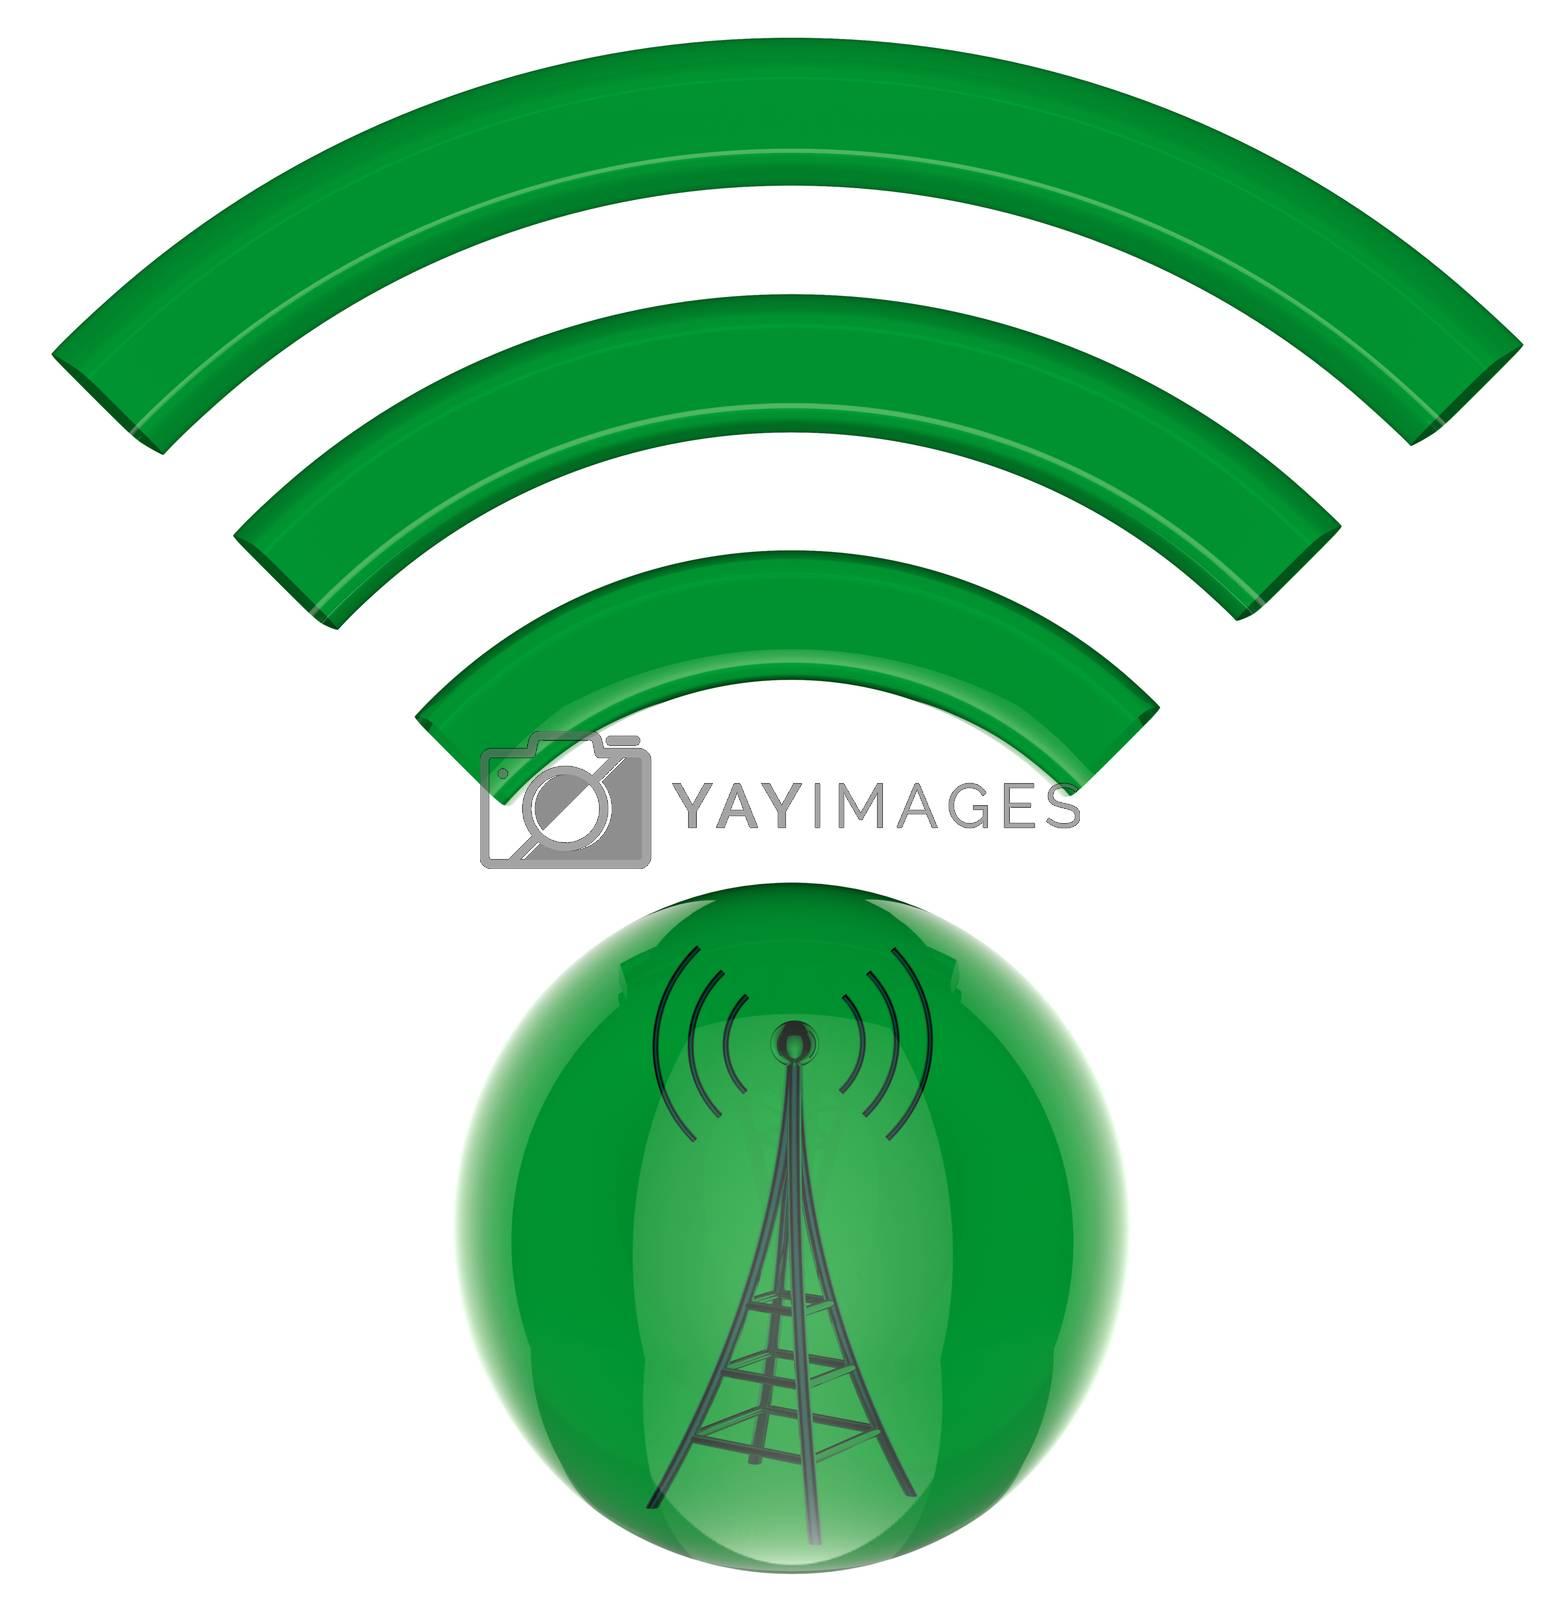 3D model, button. Digital transmitter sends information signals